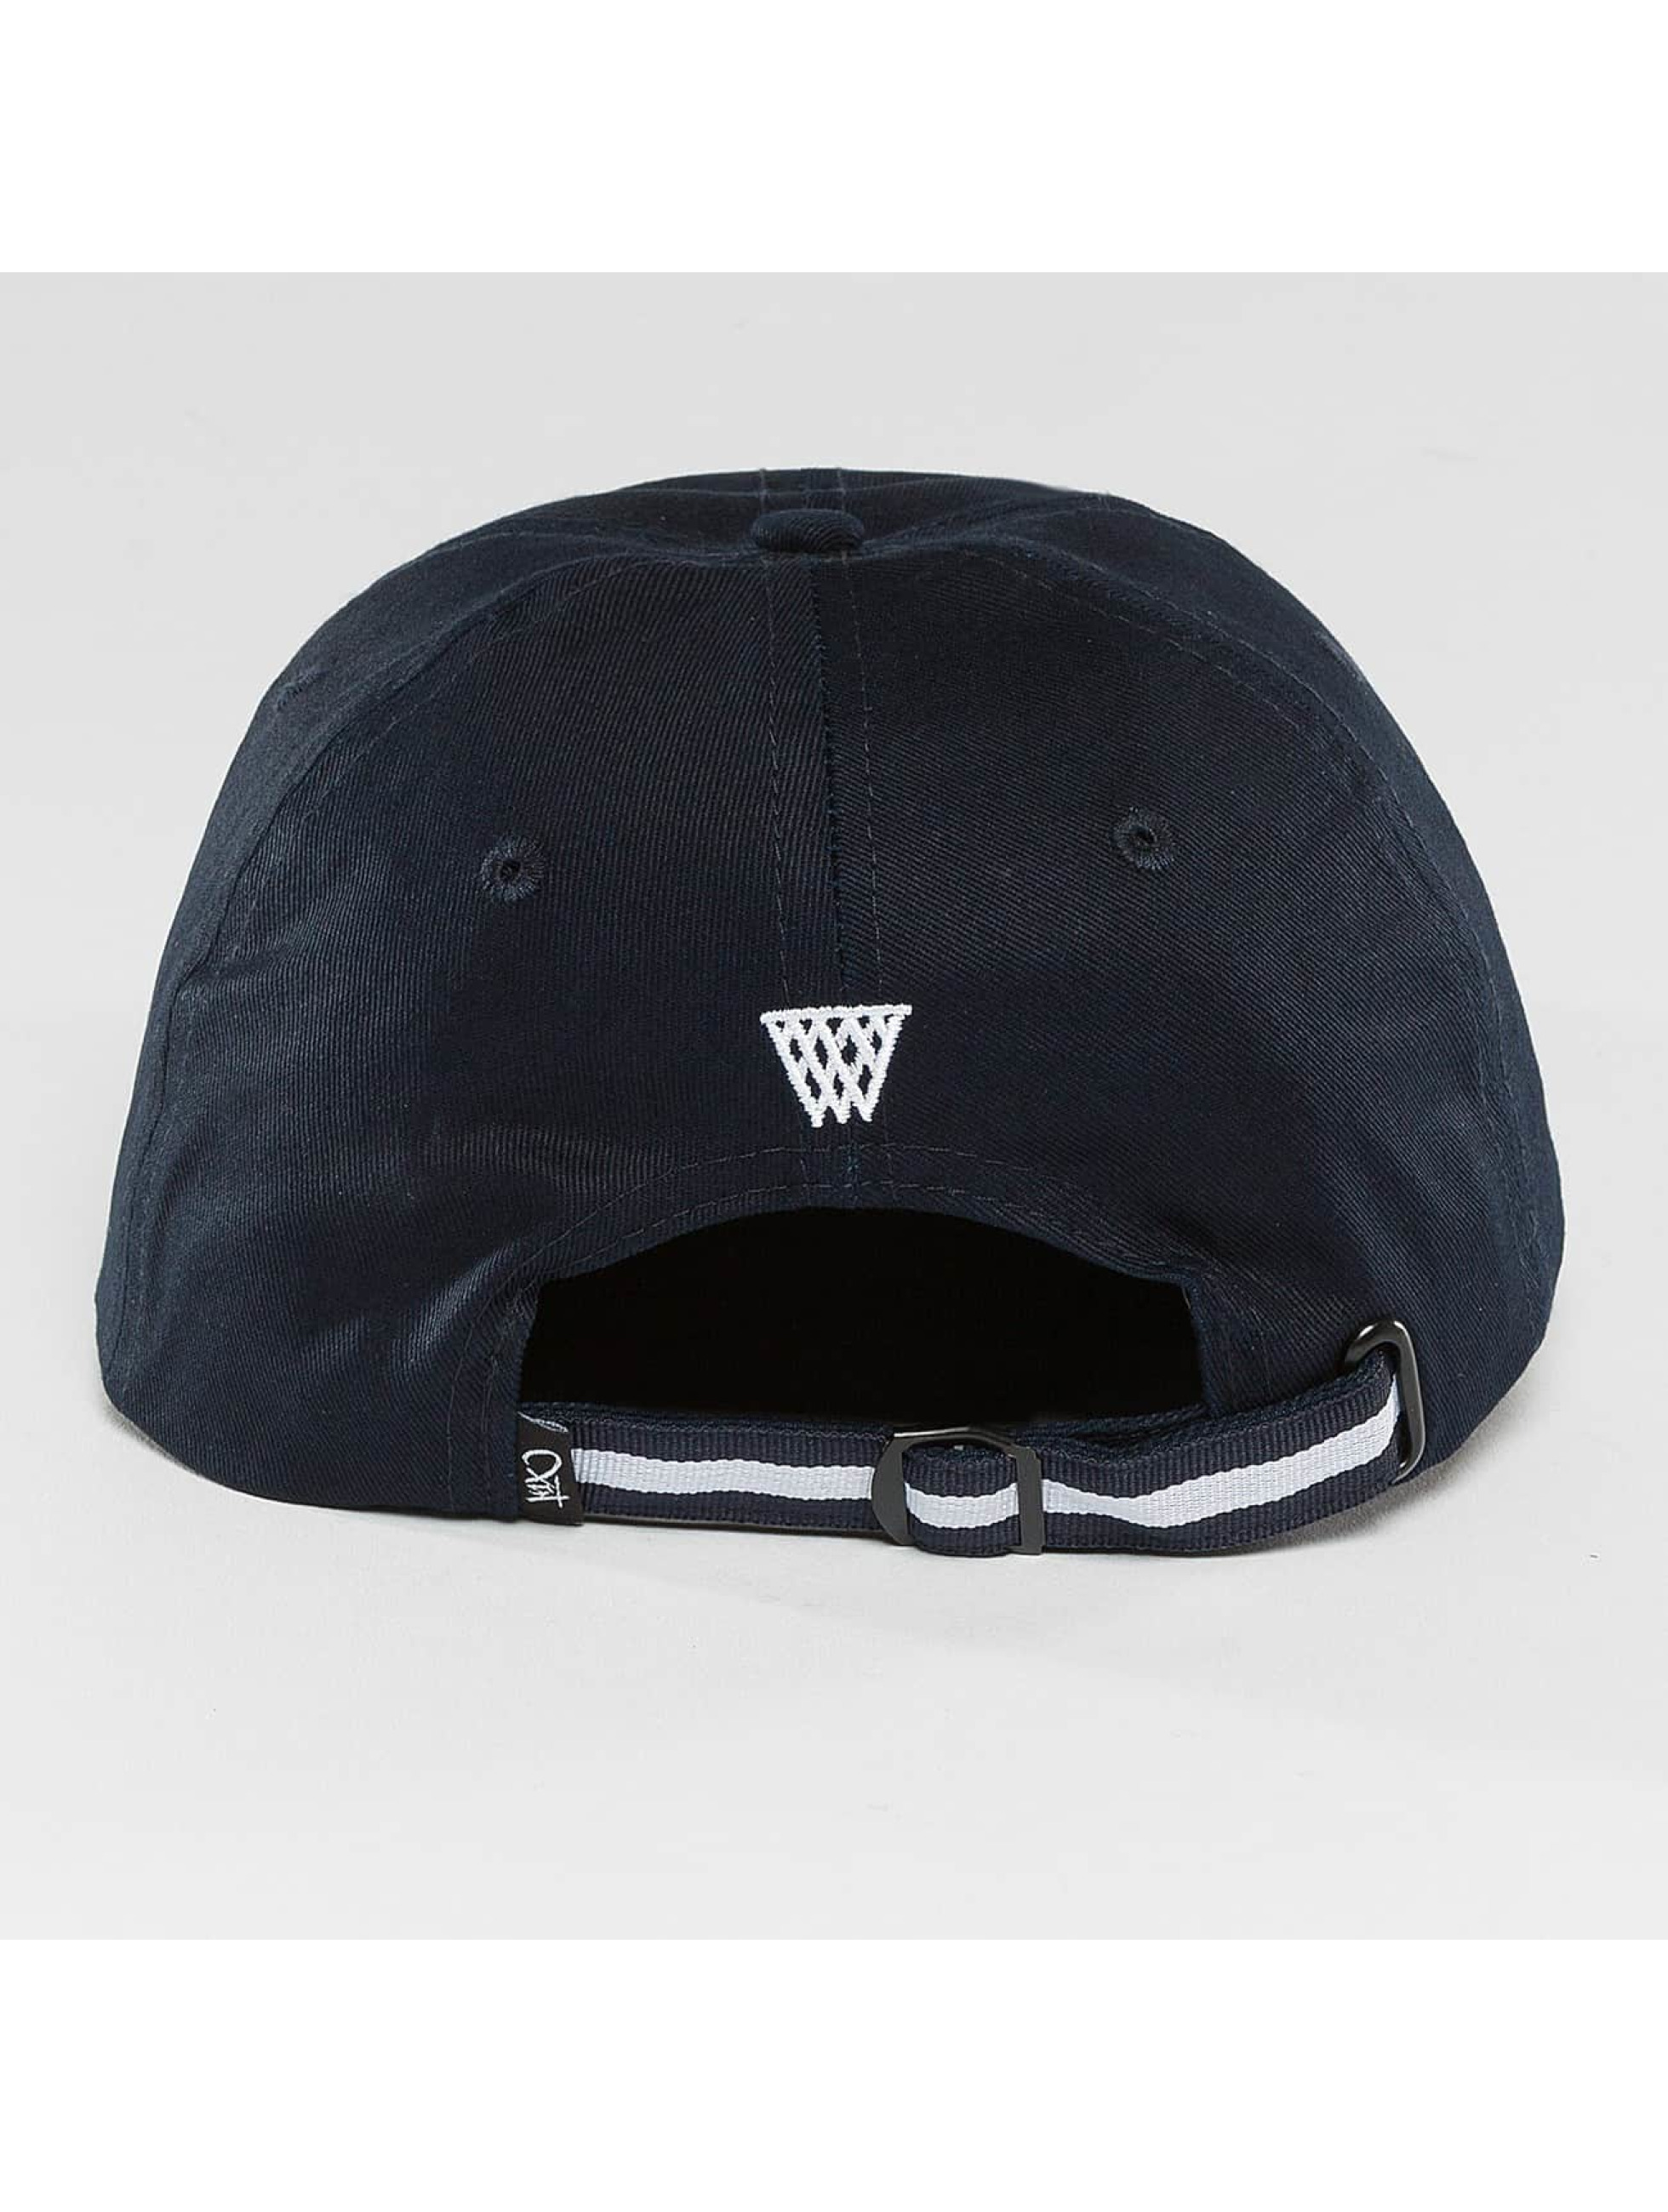 K1X Casquette Snapback & Strapback Ivey Sports bleu